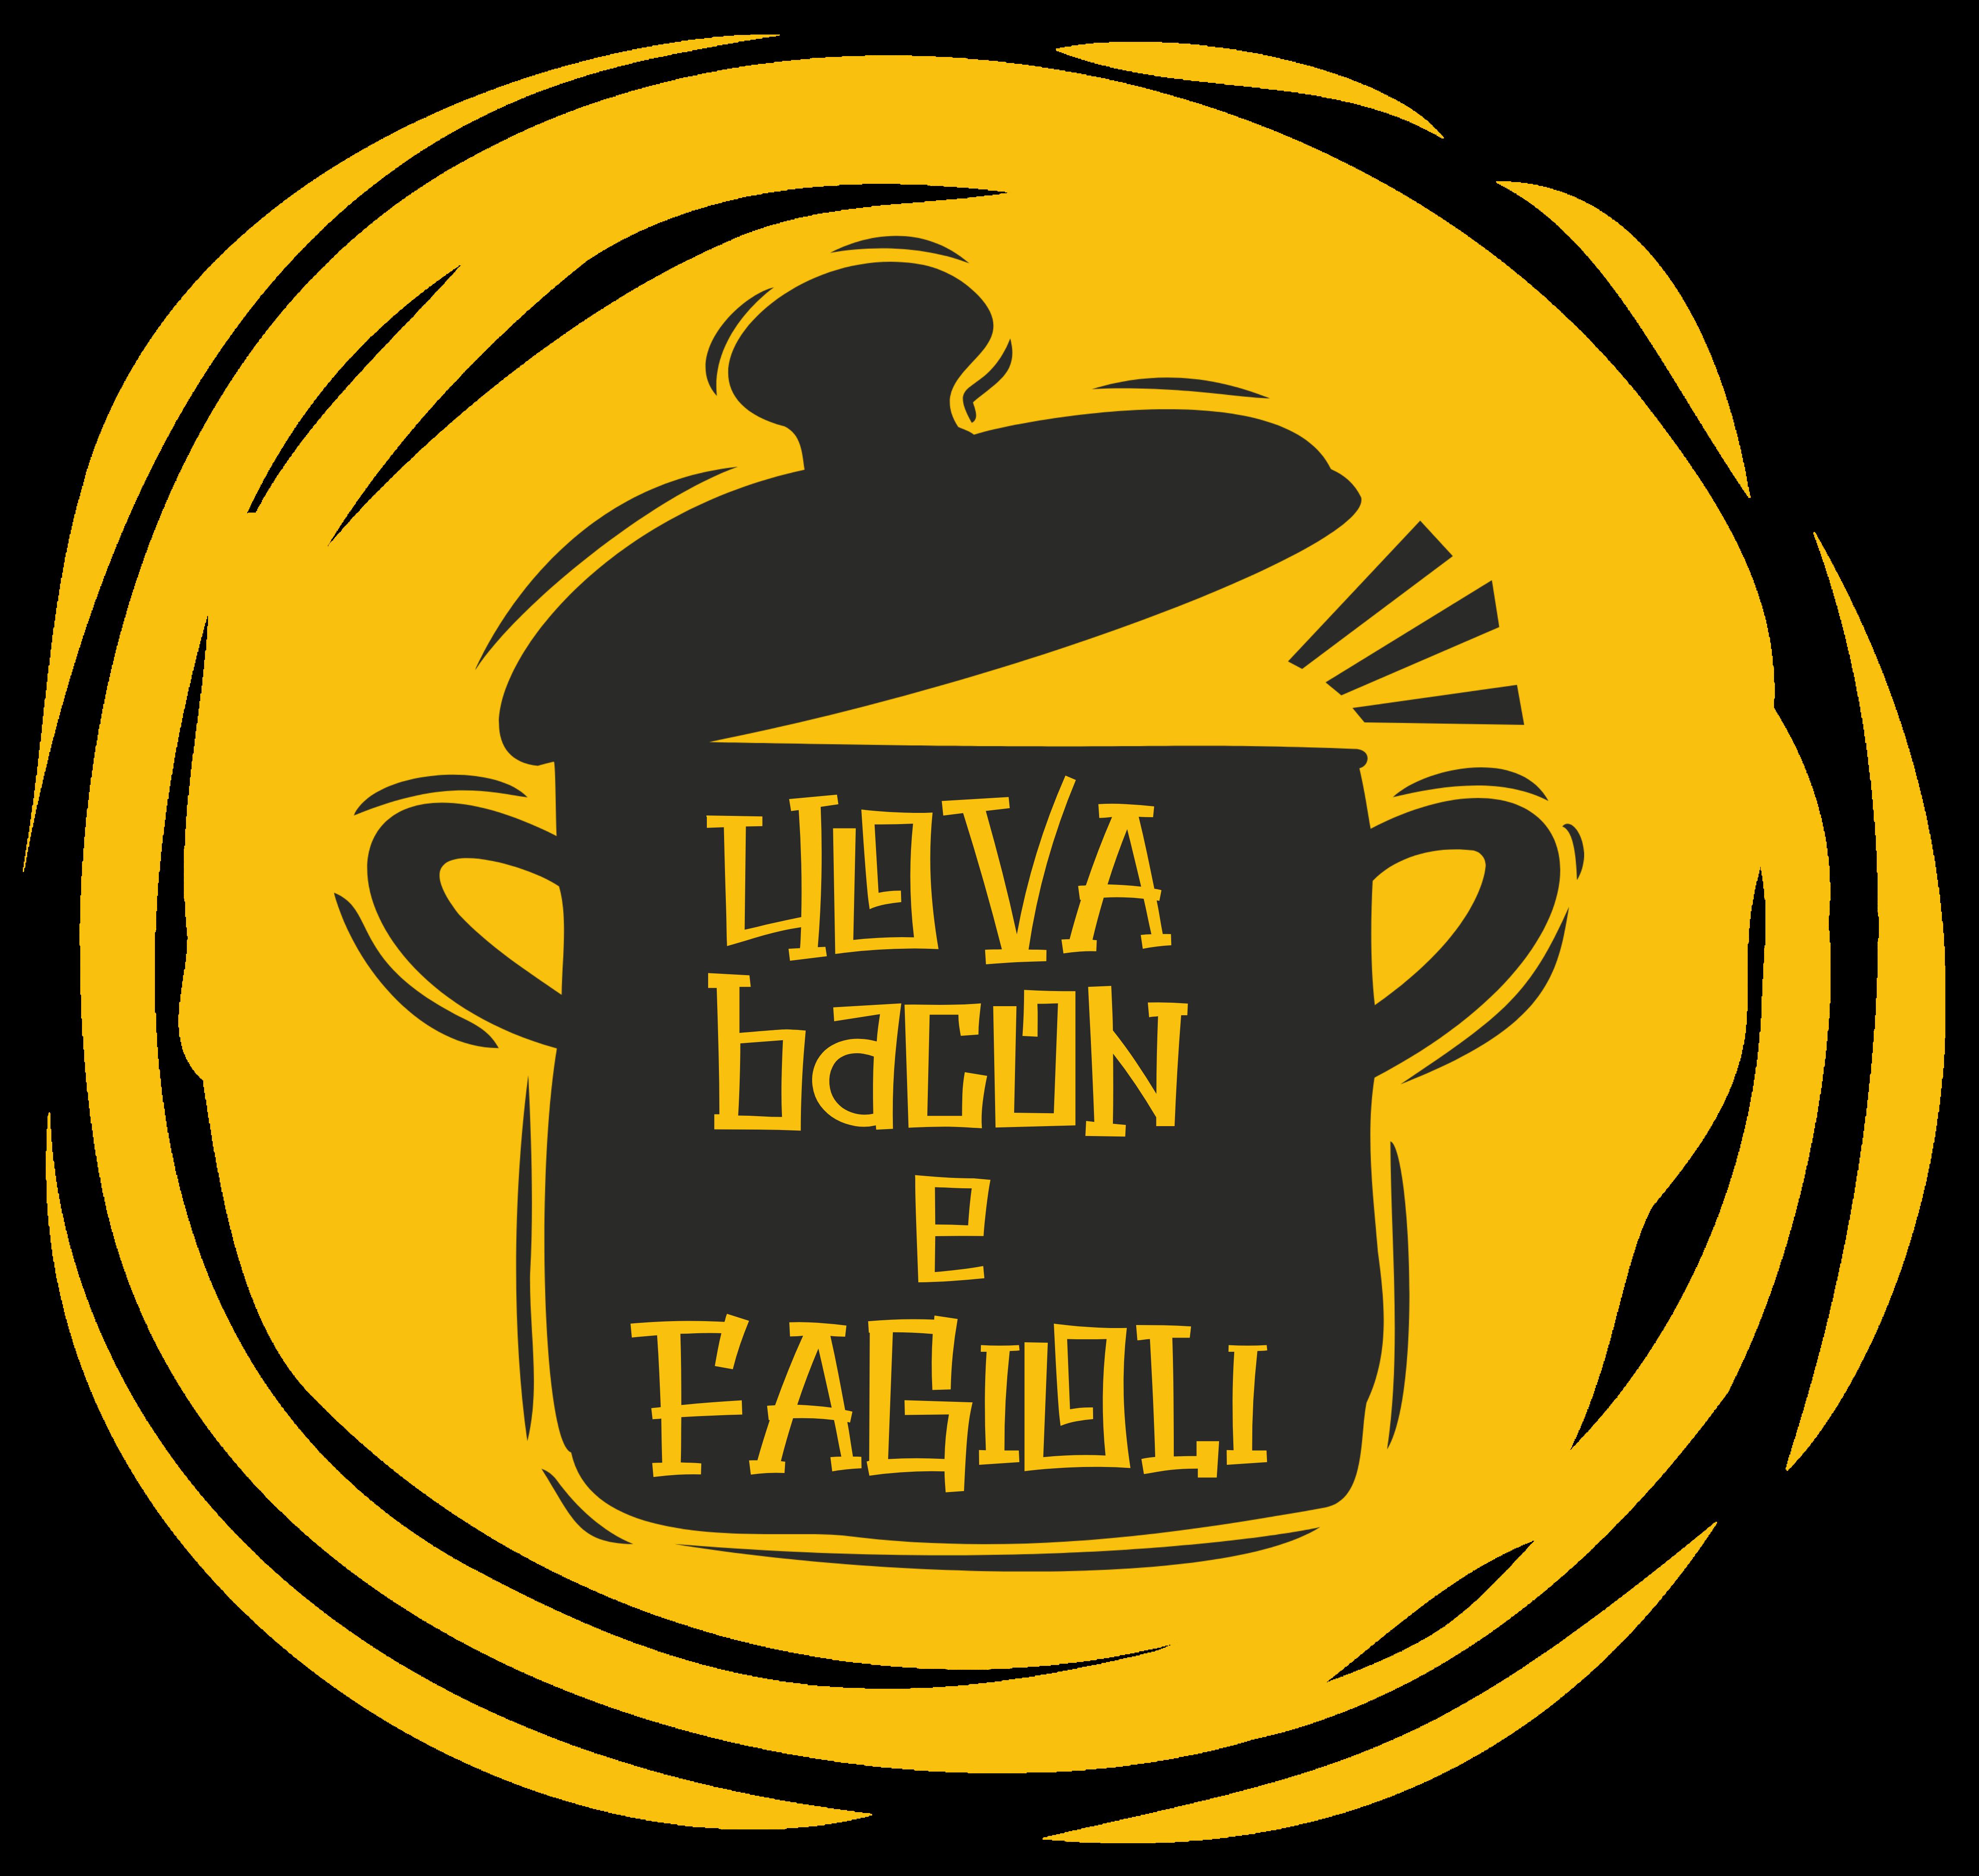 Uova, bacon e fagioli – Foodblog itinerante